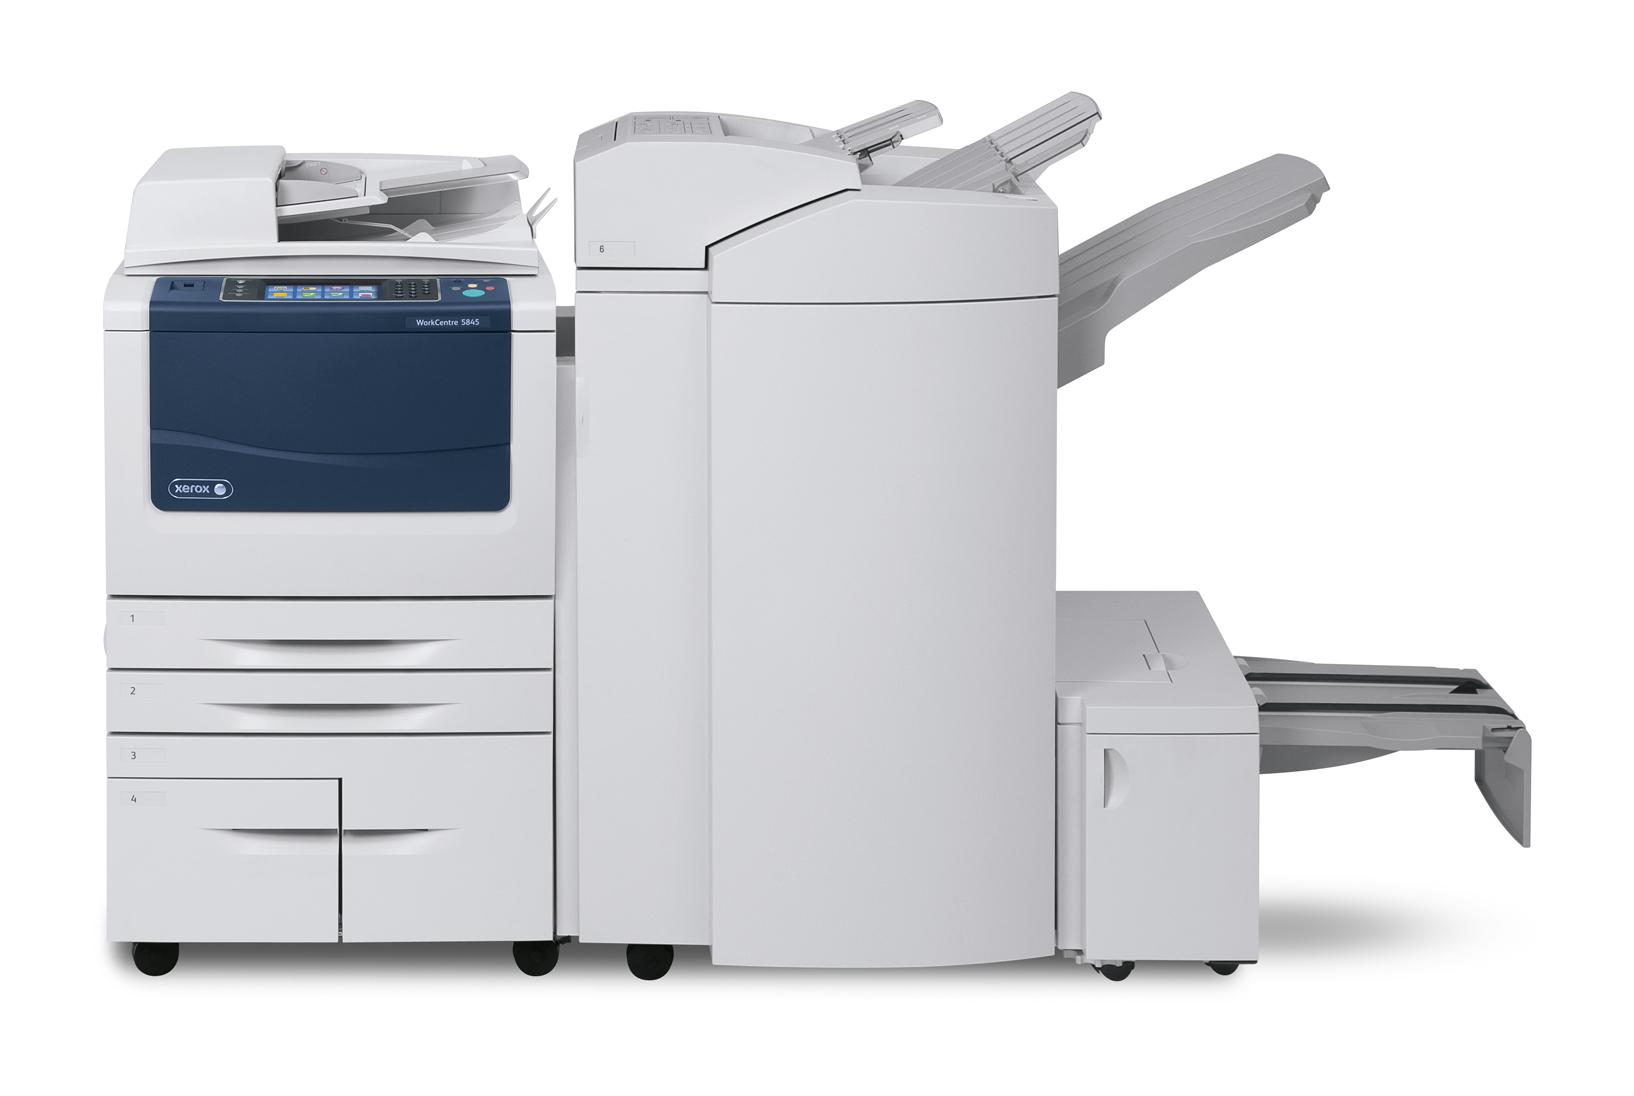 Xerox workcentre 5845 5855 5865 5875 5890